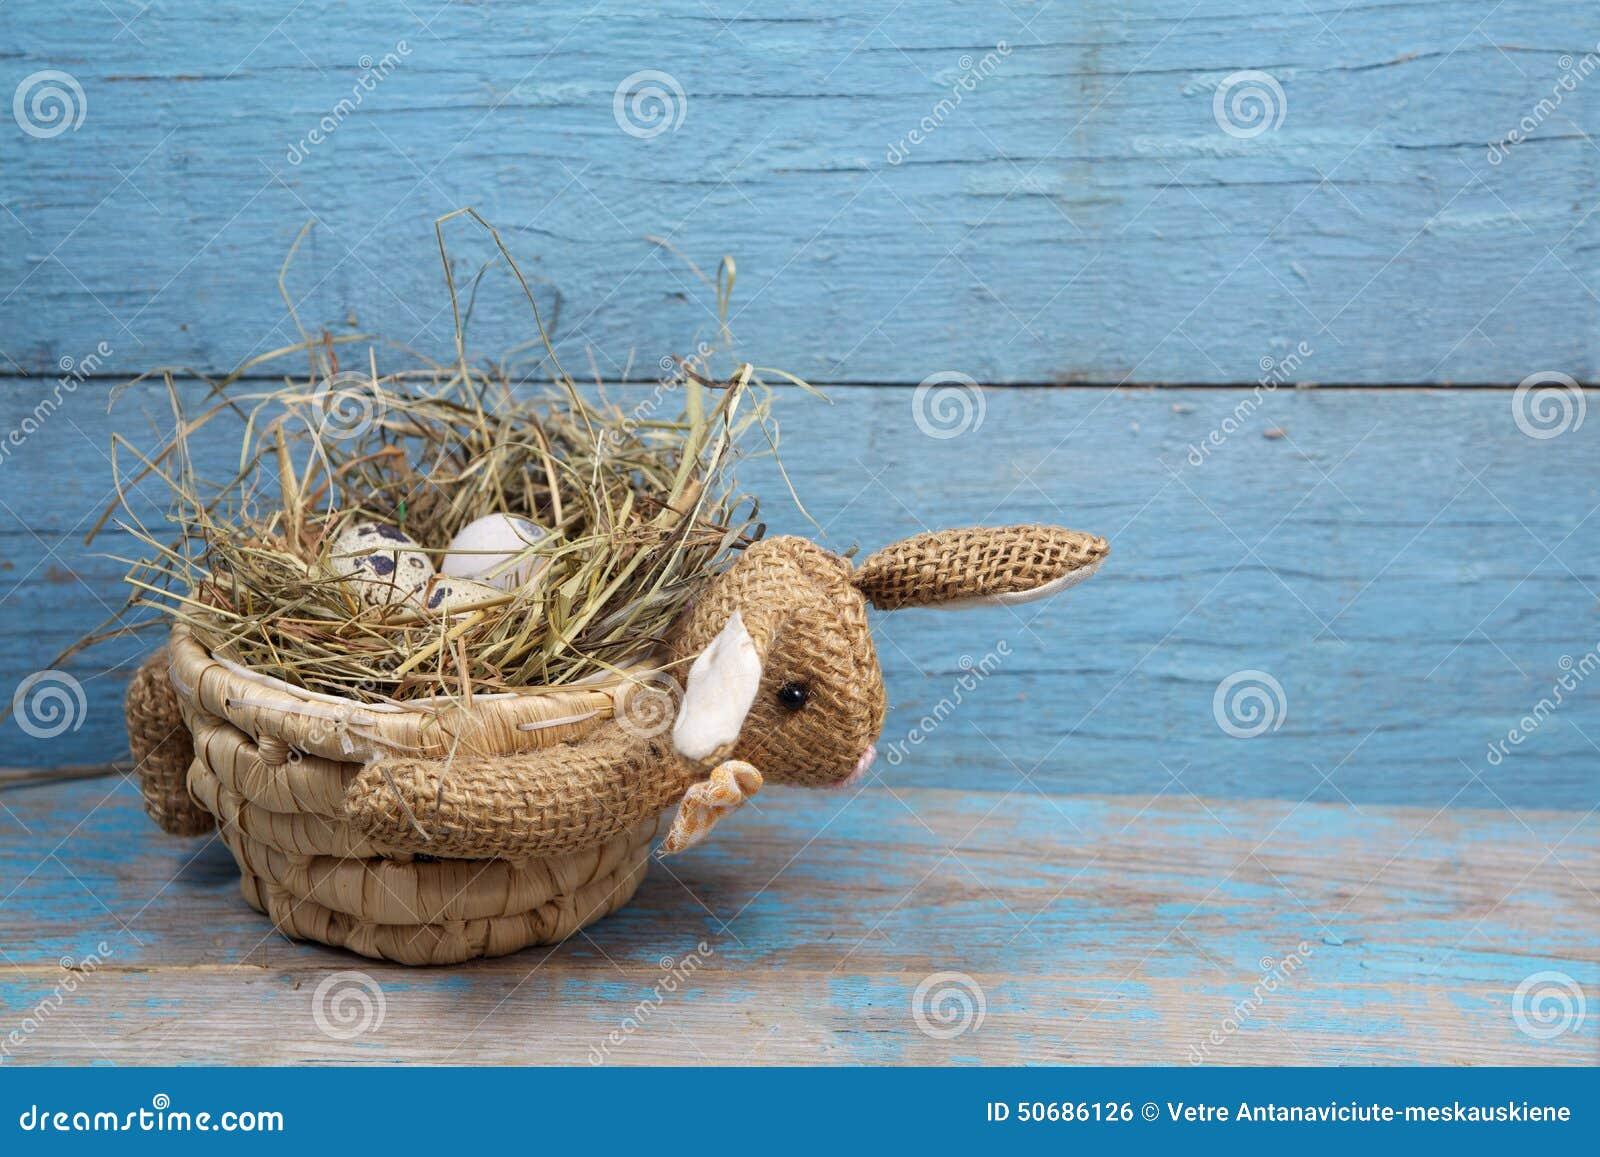 Download 兔子型篮子用鸡蛋 库存照片. 图片 包括有 传统, 季节, 空白, 复活节, 节假日, 葡萄酒, 兔子, bataan - 50686126